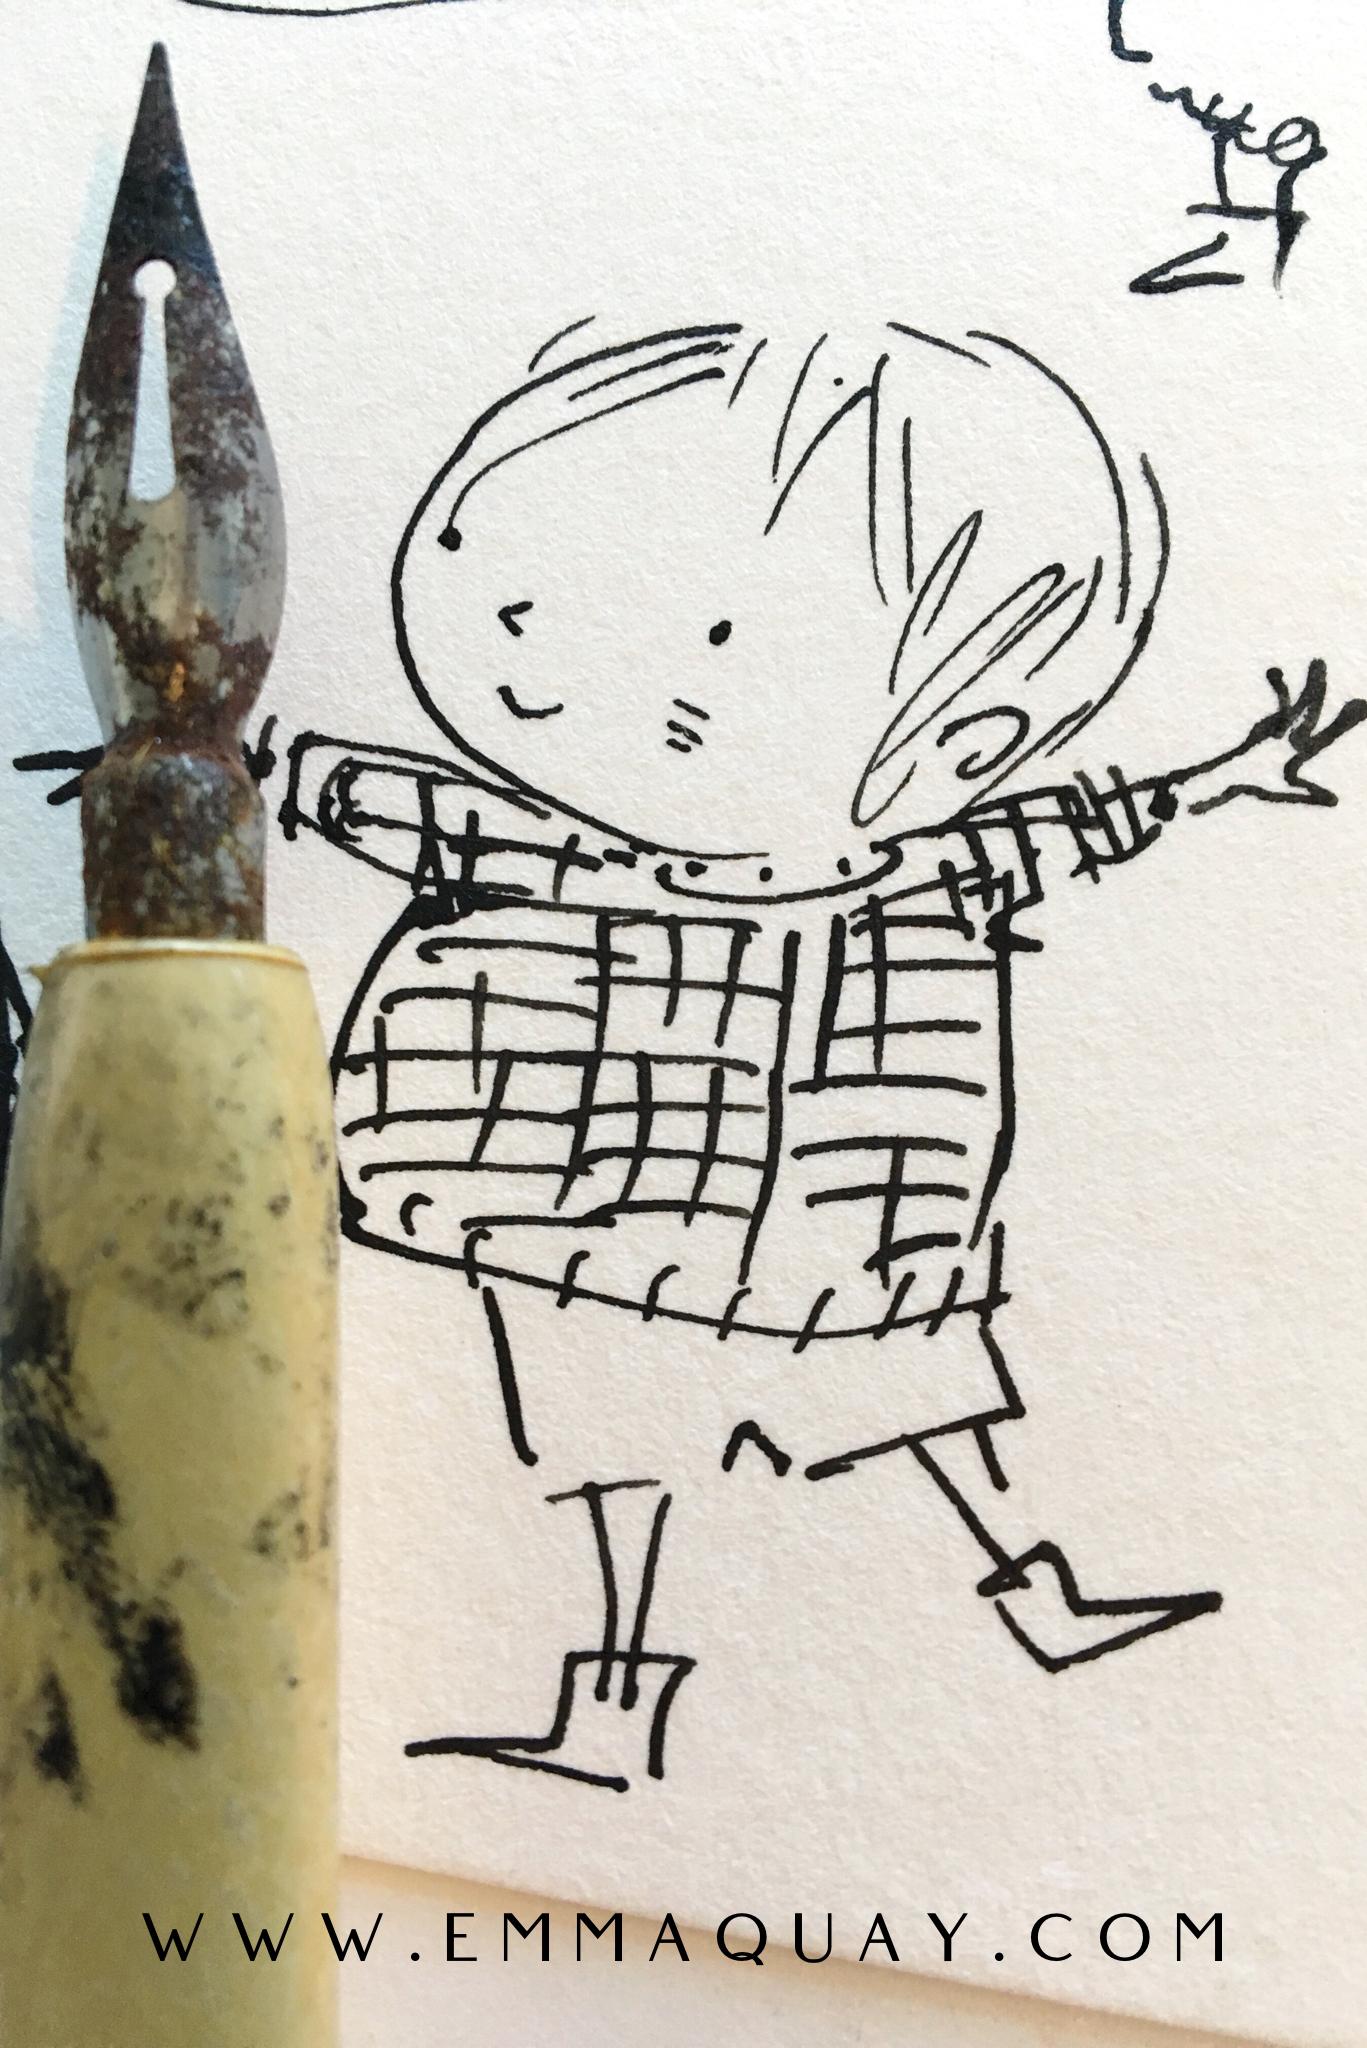 My Sketchbook - Drawings on the go